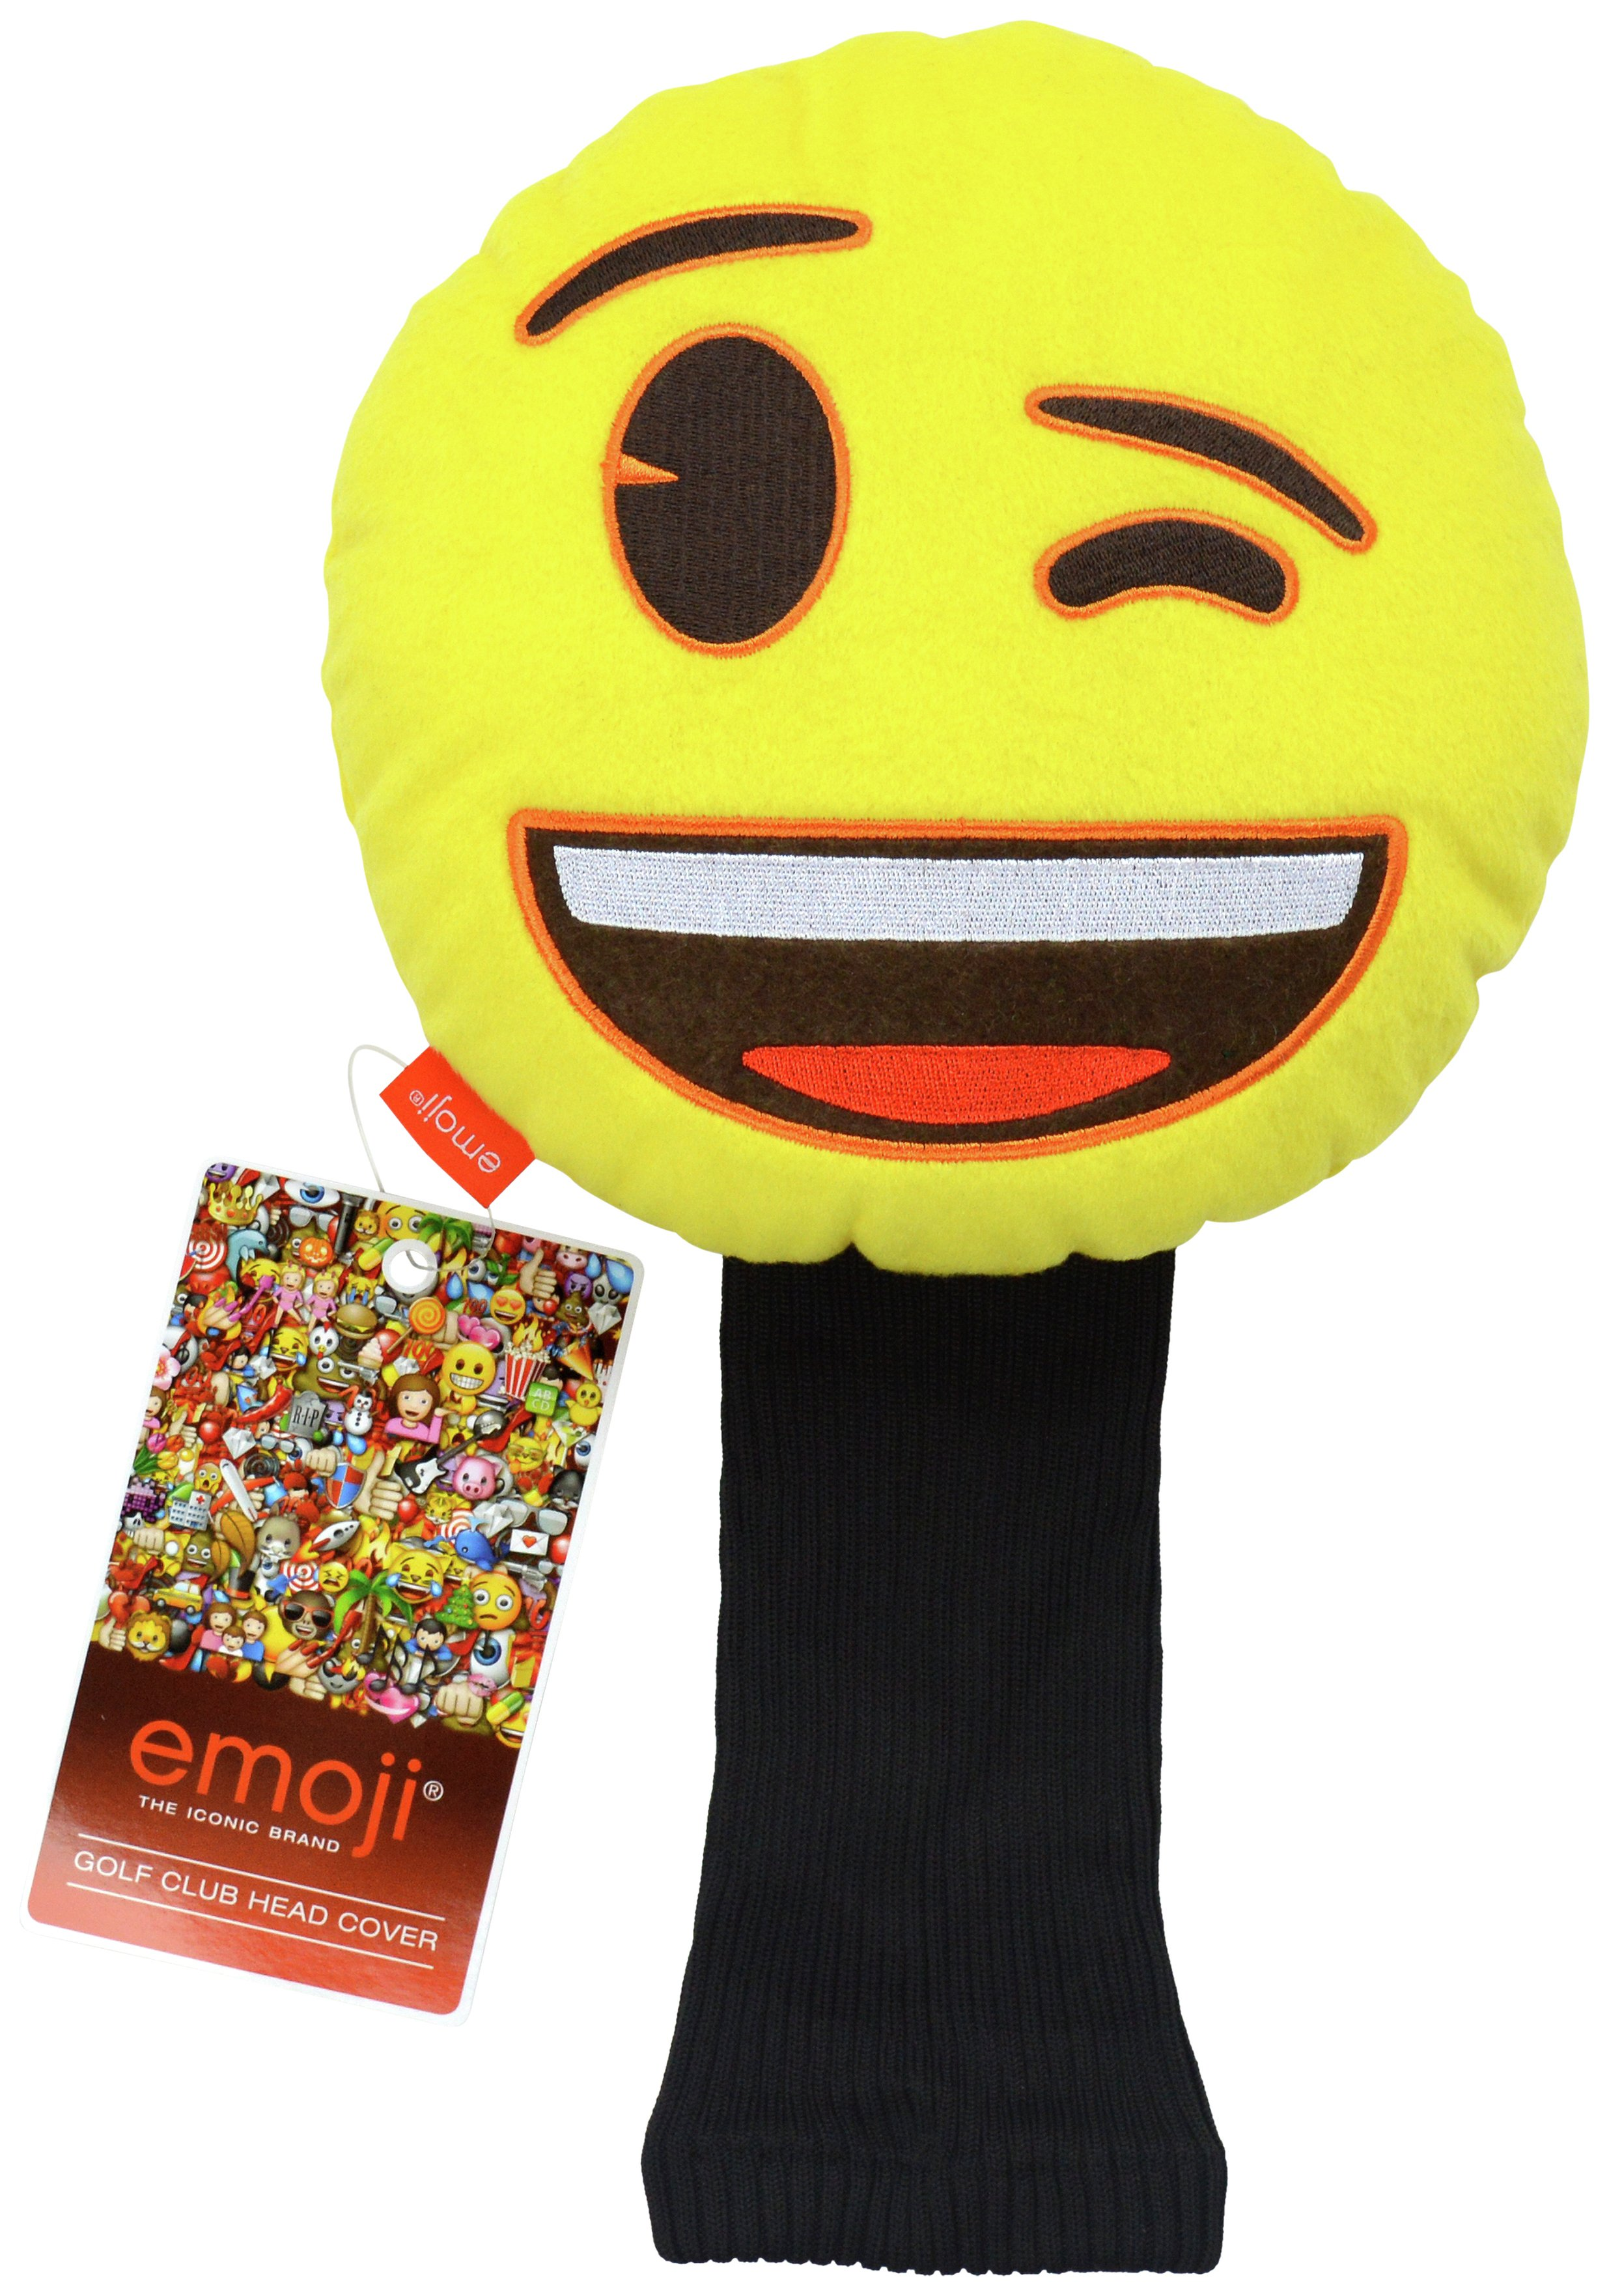 Emoji Golf Headcover - Wink